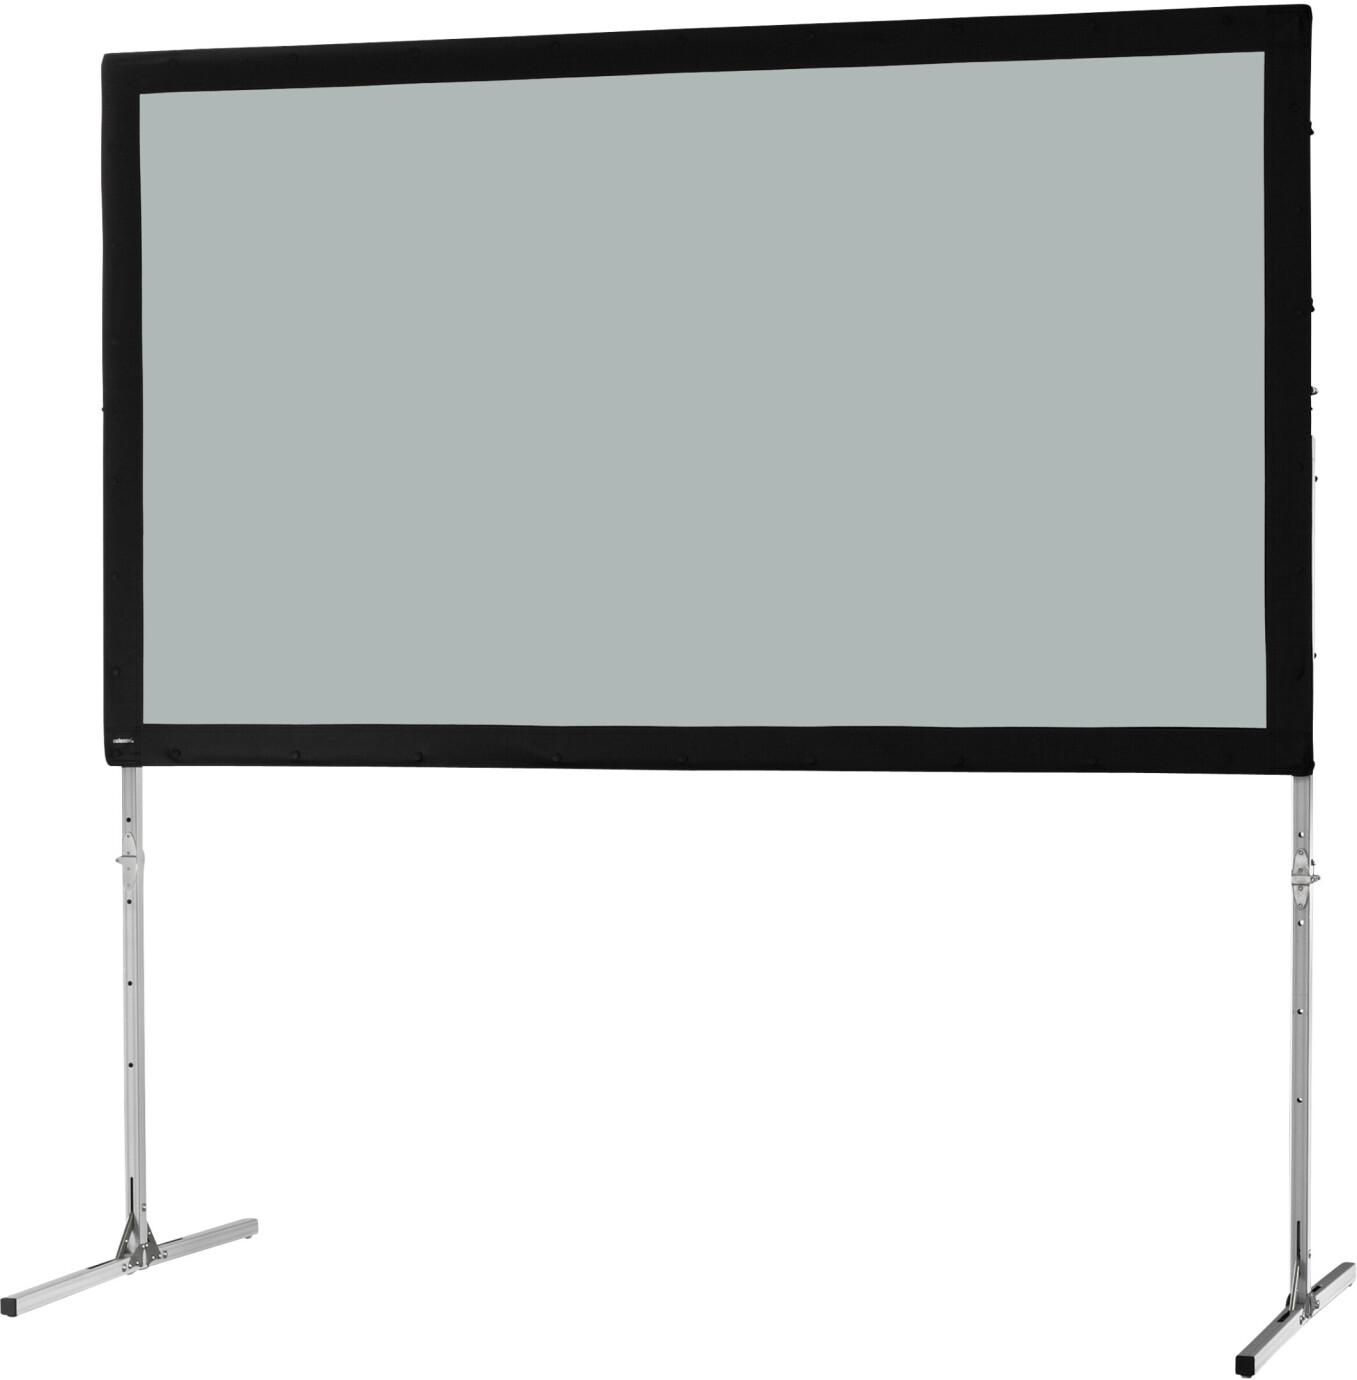 celexon Folding Frame screen 366 x 206cm Mobile Expert, rear projection